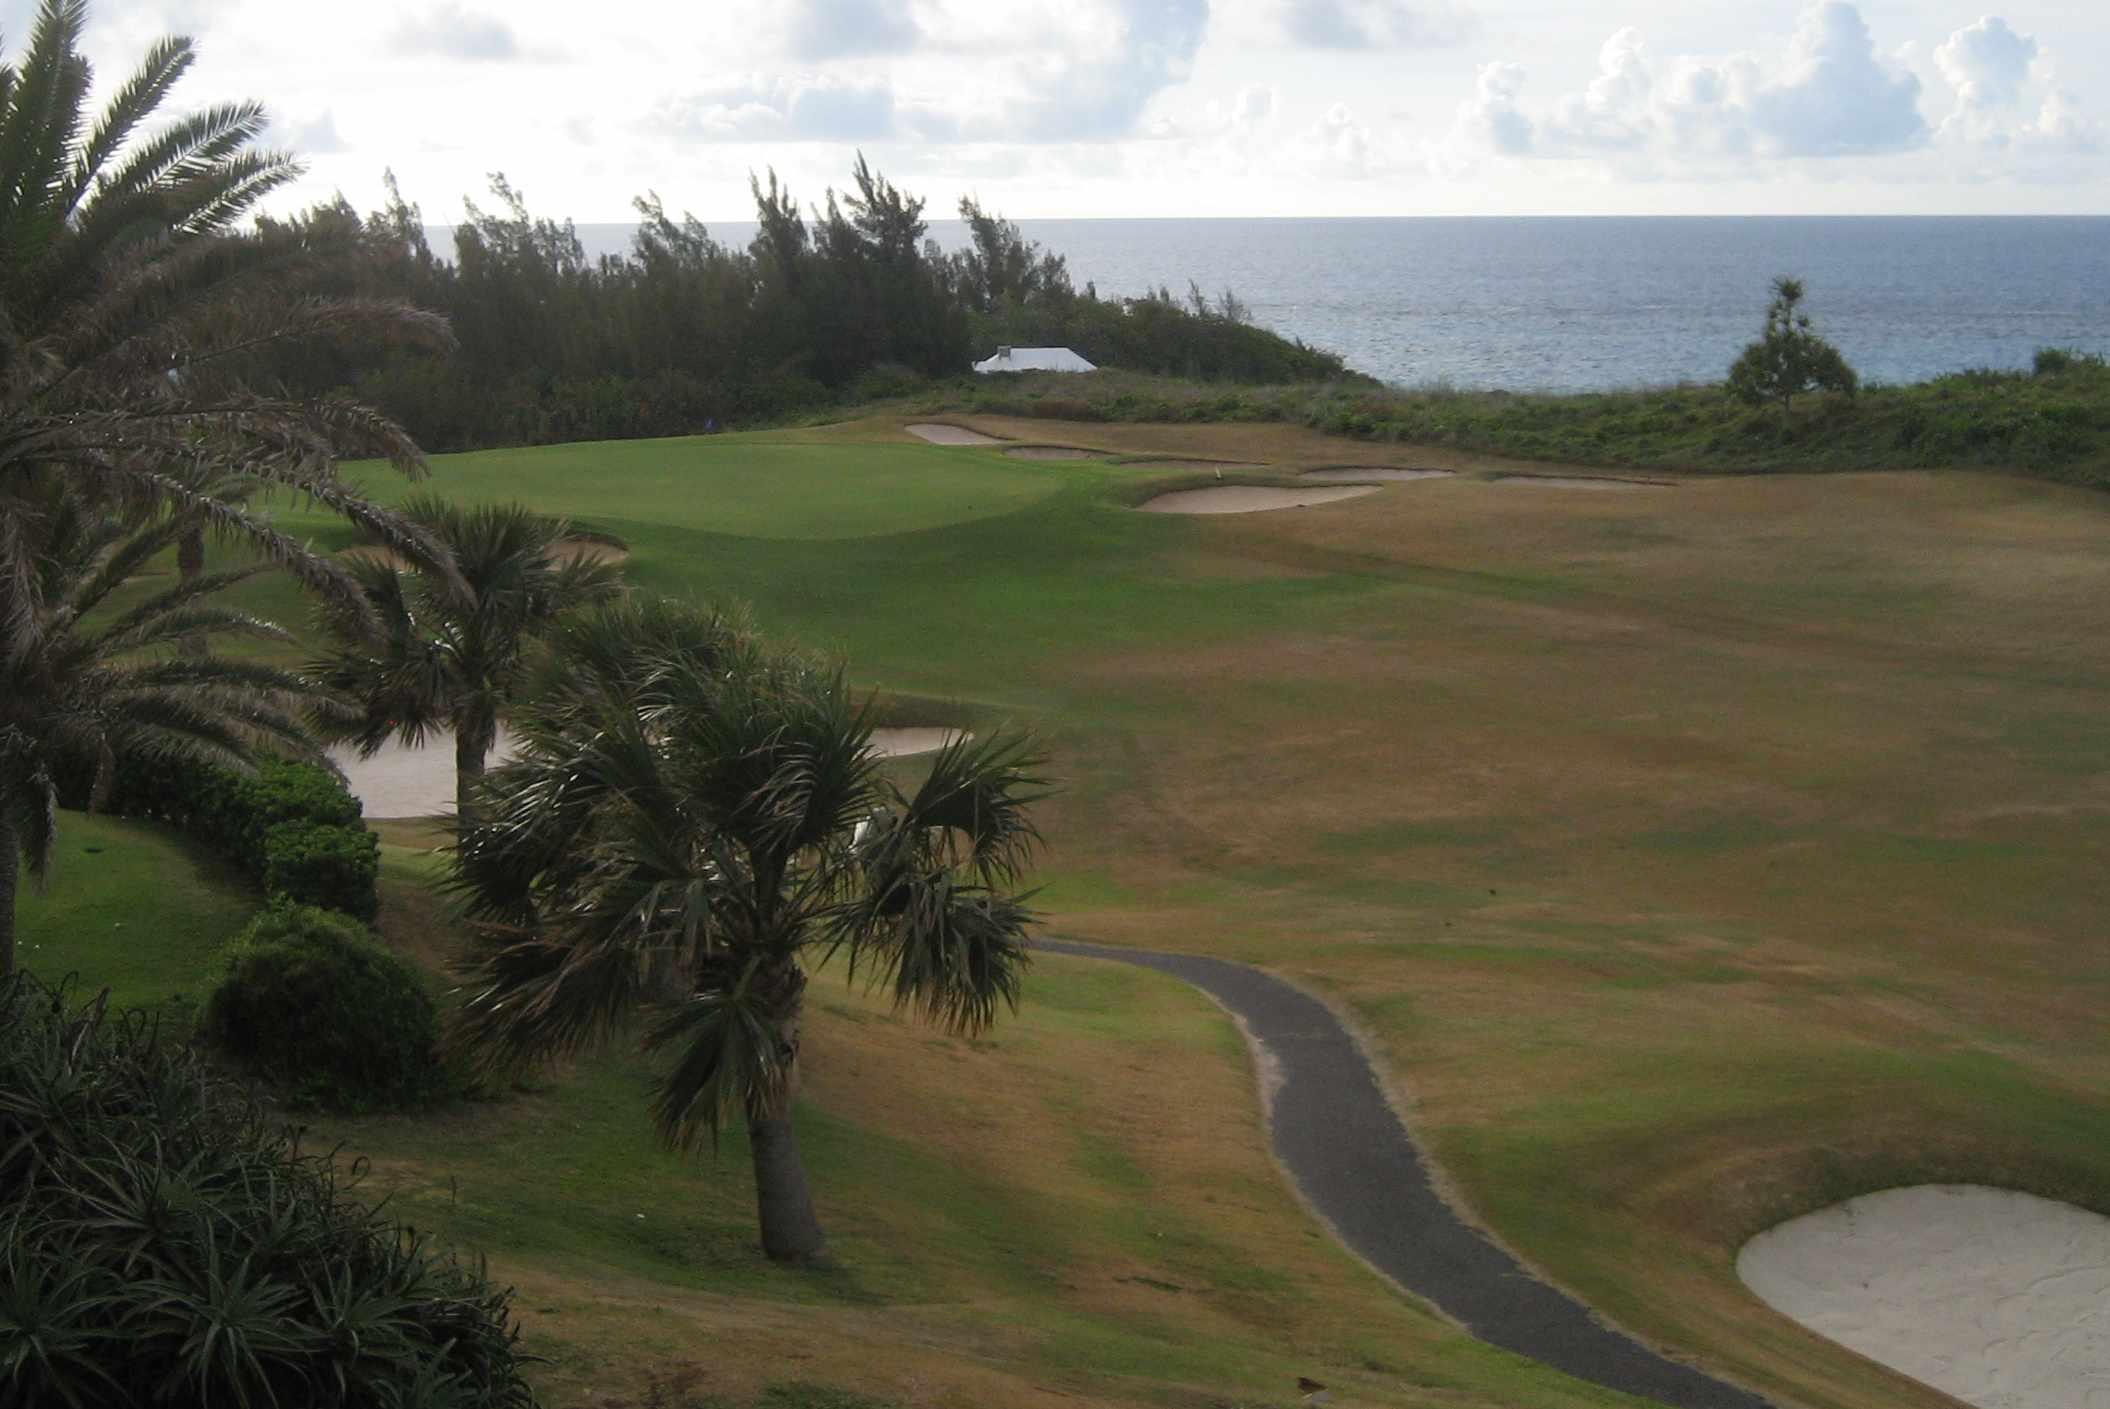 Golf course at Mid Ocean Club in Bermuda.